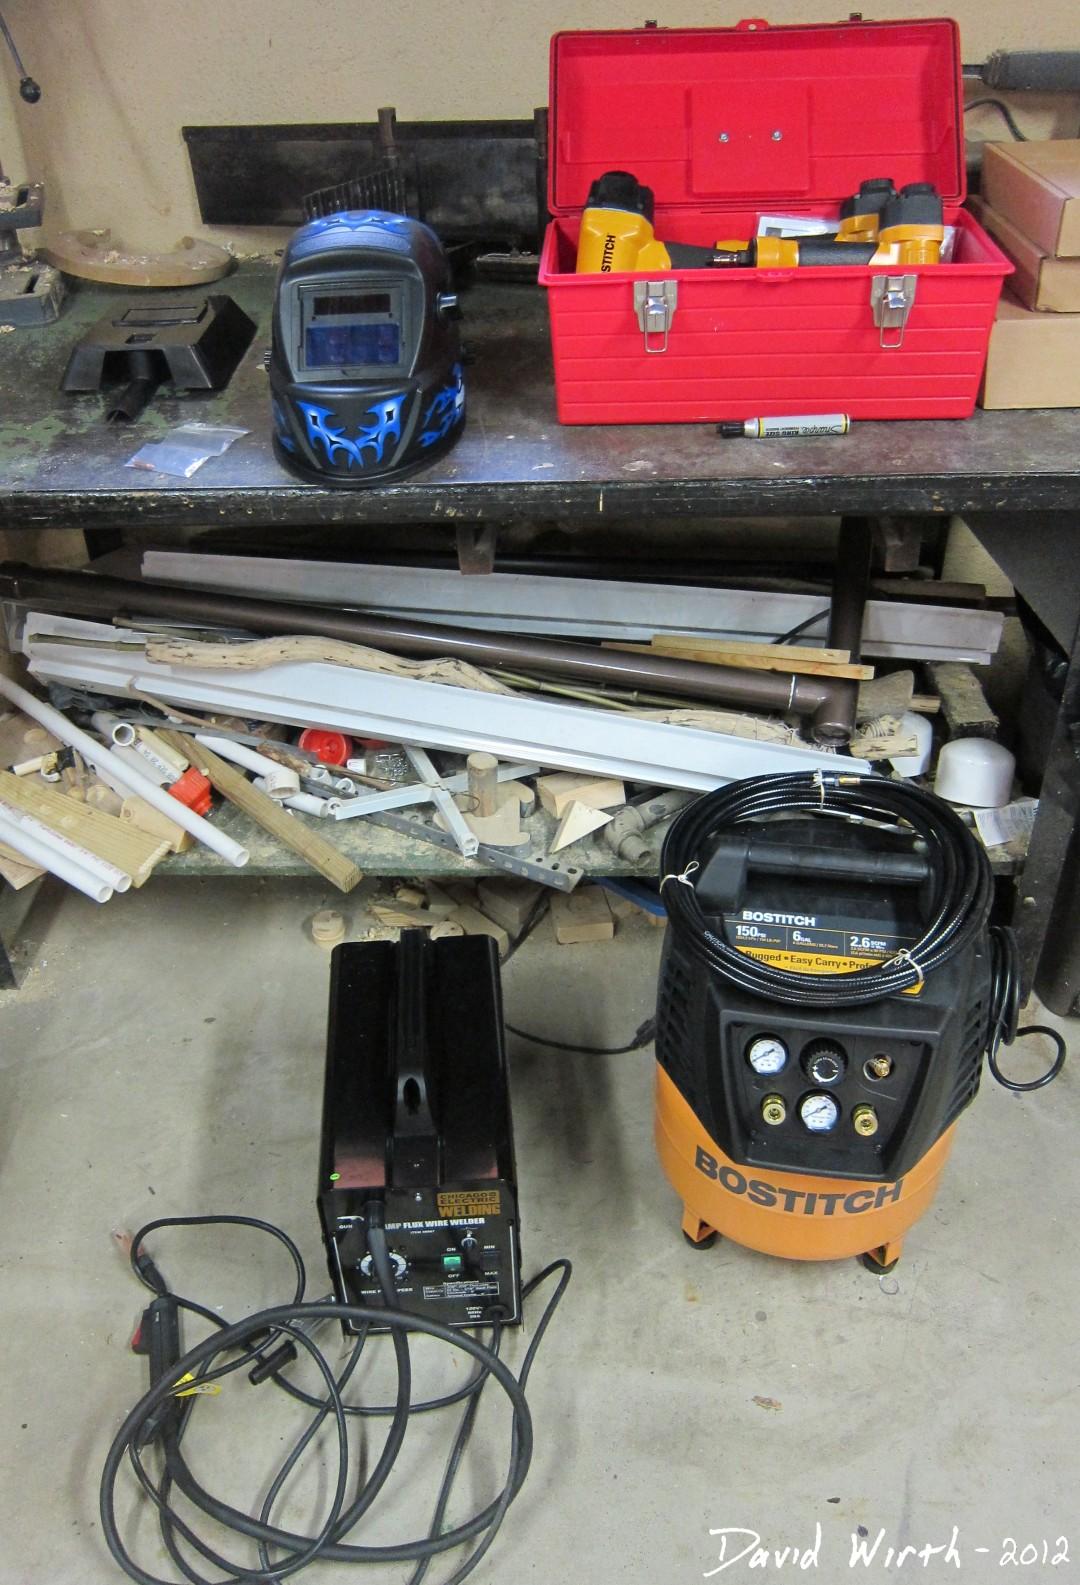 hight resolution of chicago electric welder harbor freight bostitch compressor nail gun